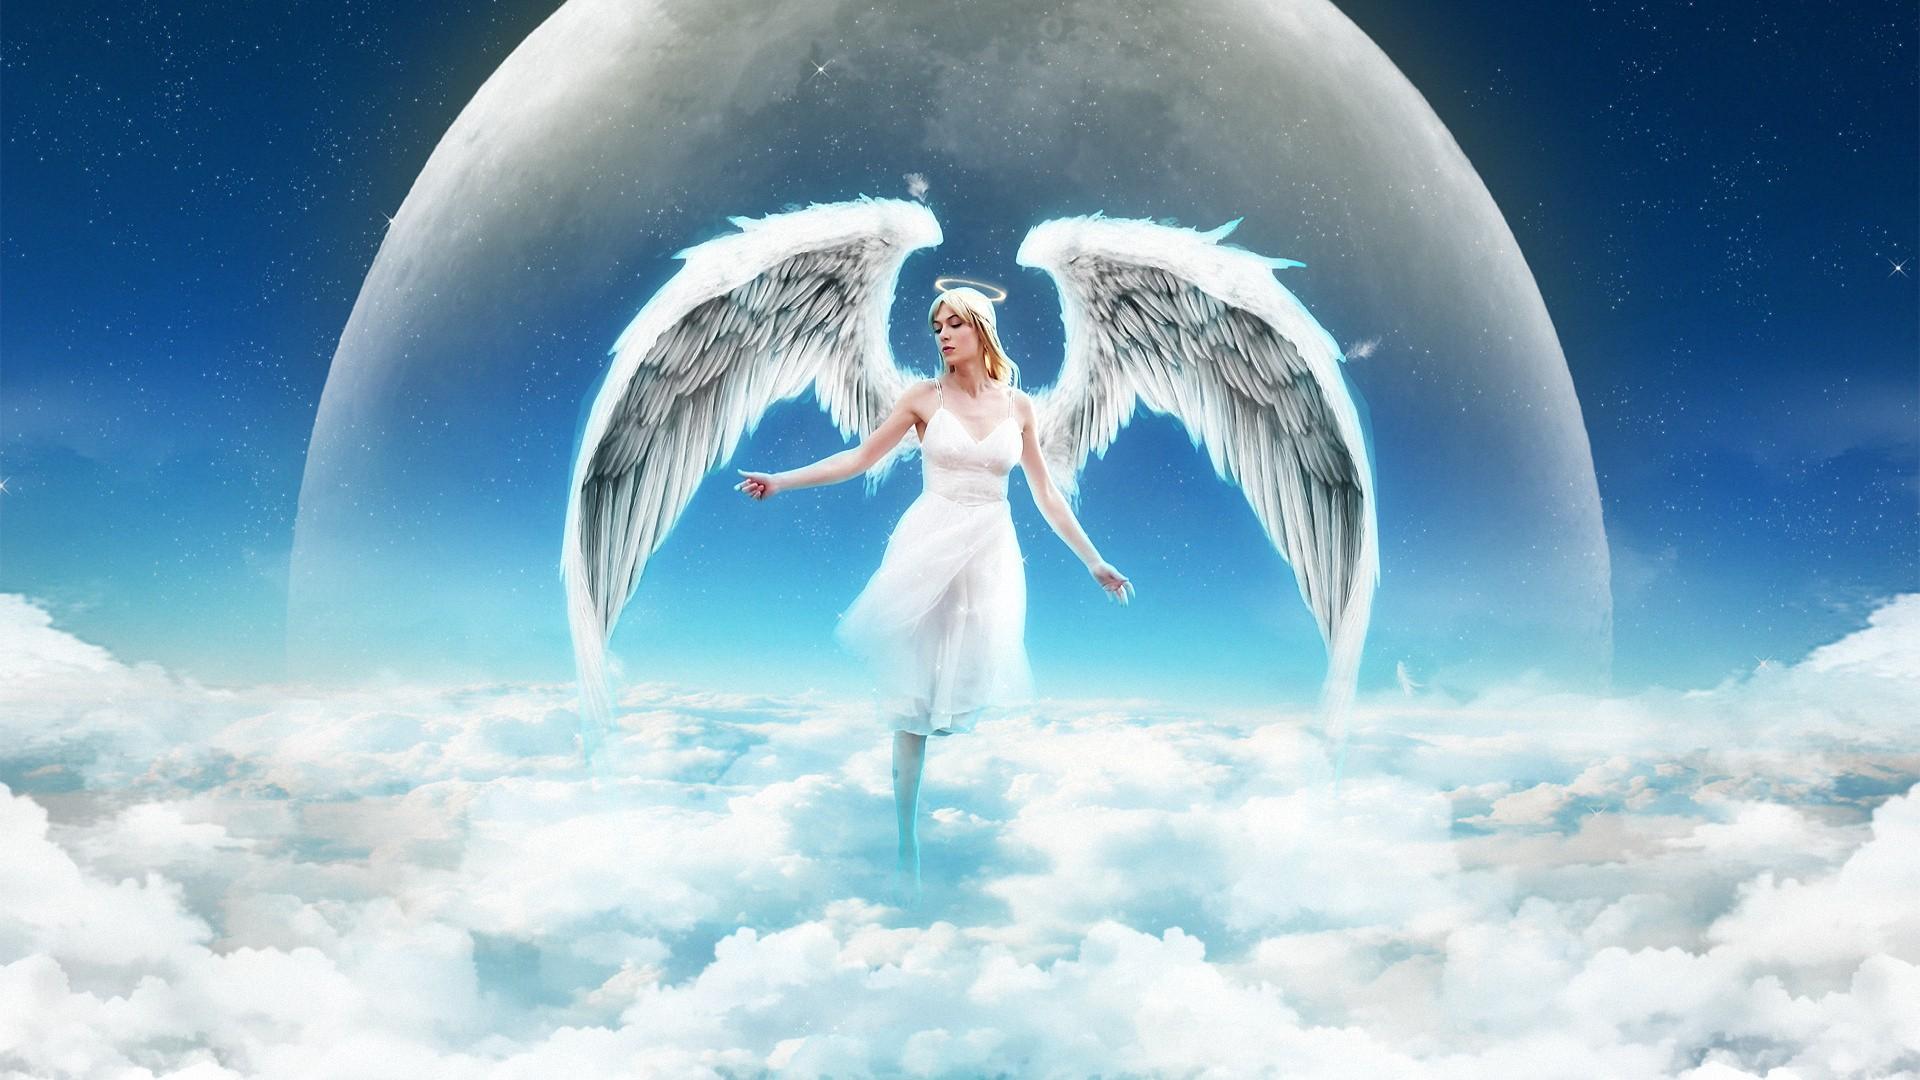 Крылья ангела картинки на рабочий стол